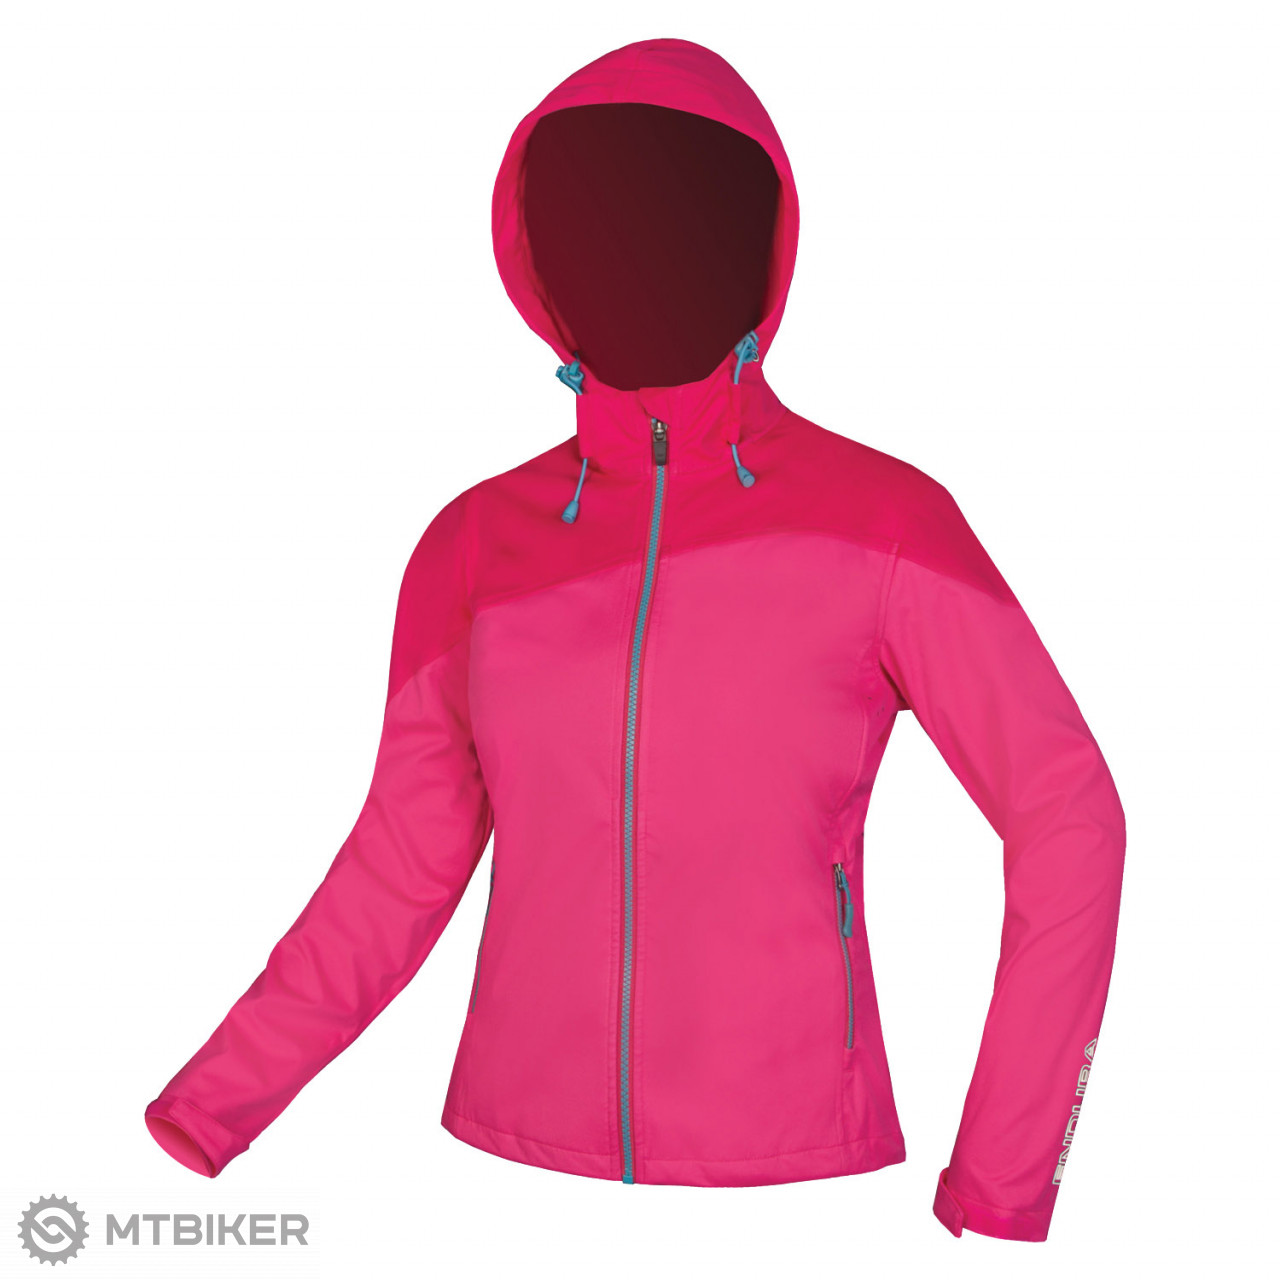 Endura Singletrack Softshell dámska bunda ružová - MTBIKER Shop 59e68acaf77